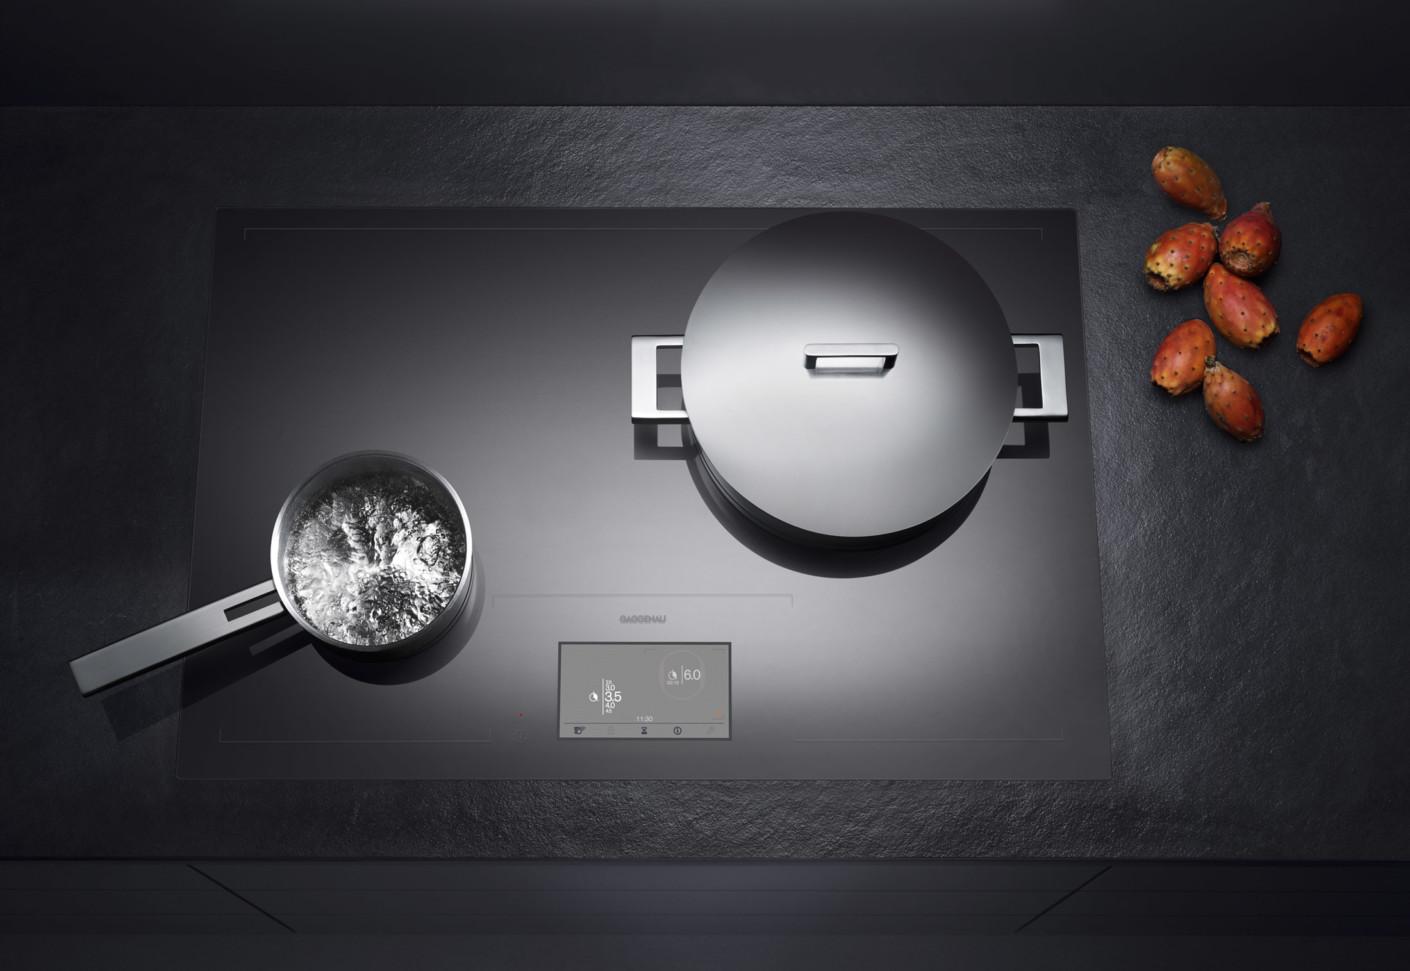 cx 480 by gaggenau stylepark. Black Bedroom Furniture Sets. Home Design Ideas